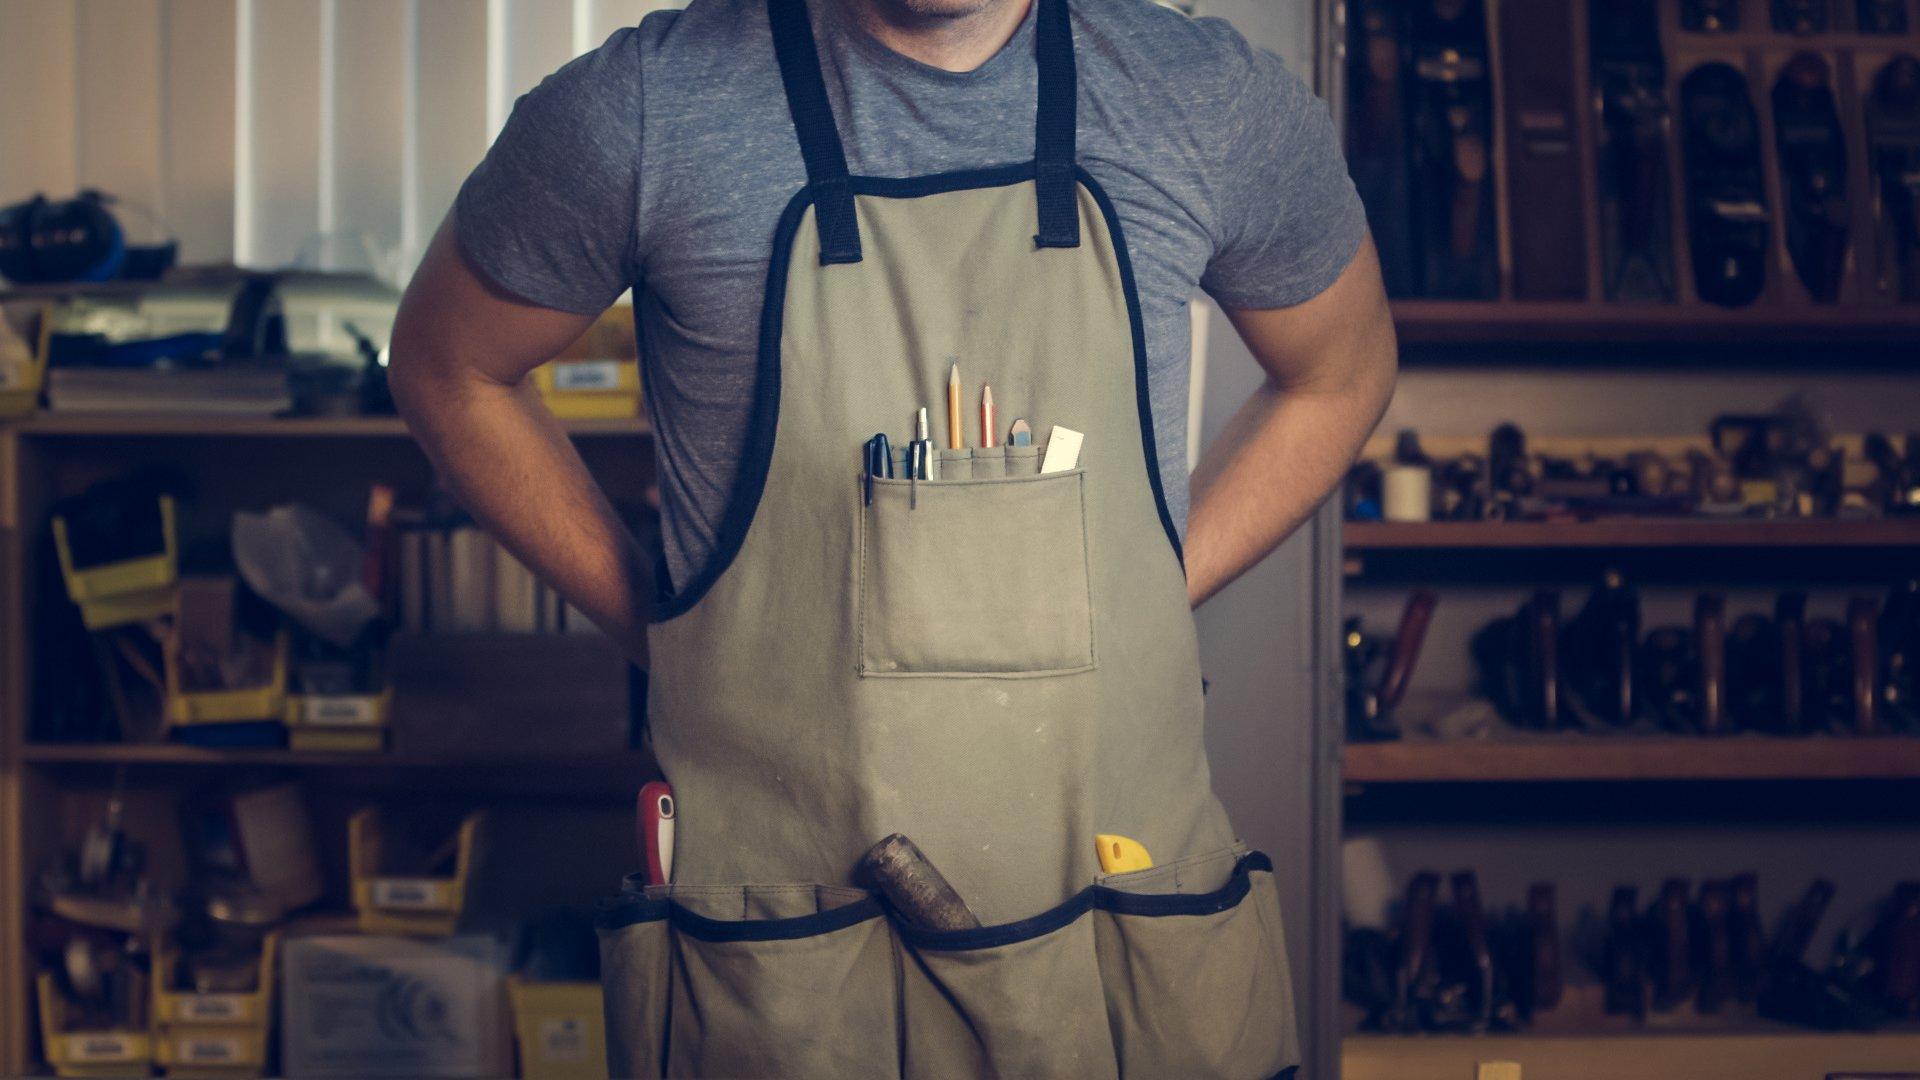 handymans-apron_4460x4460.jpg